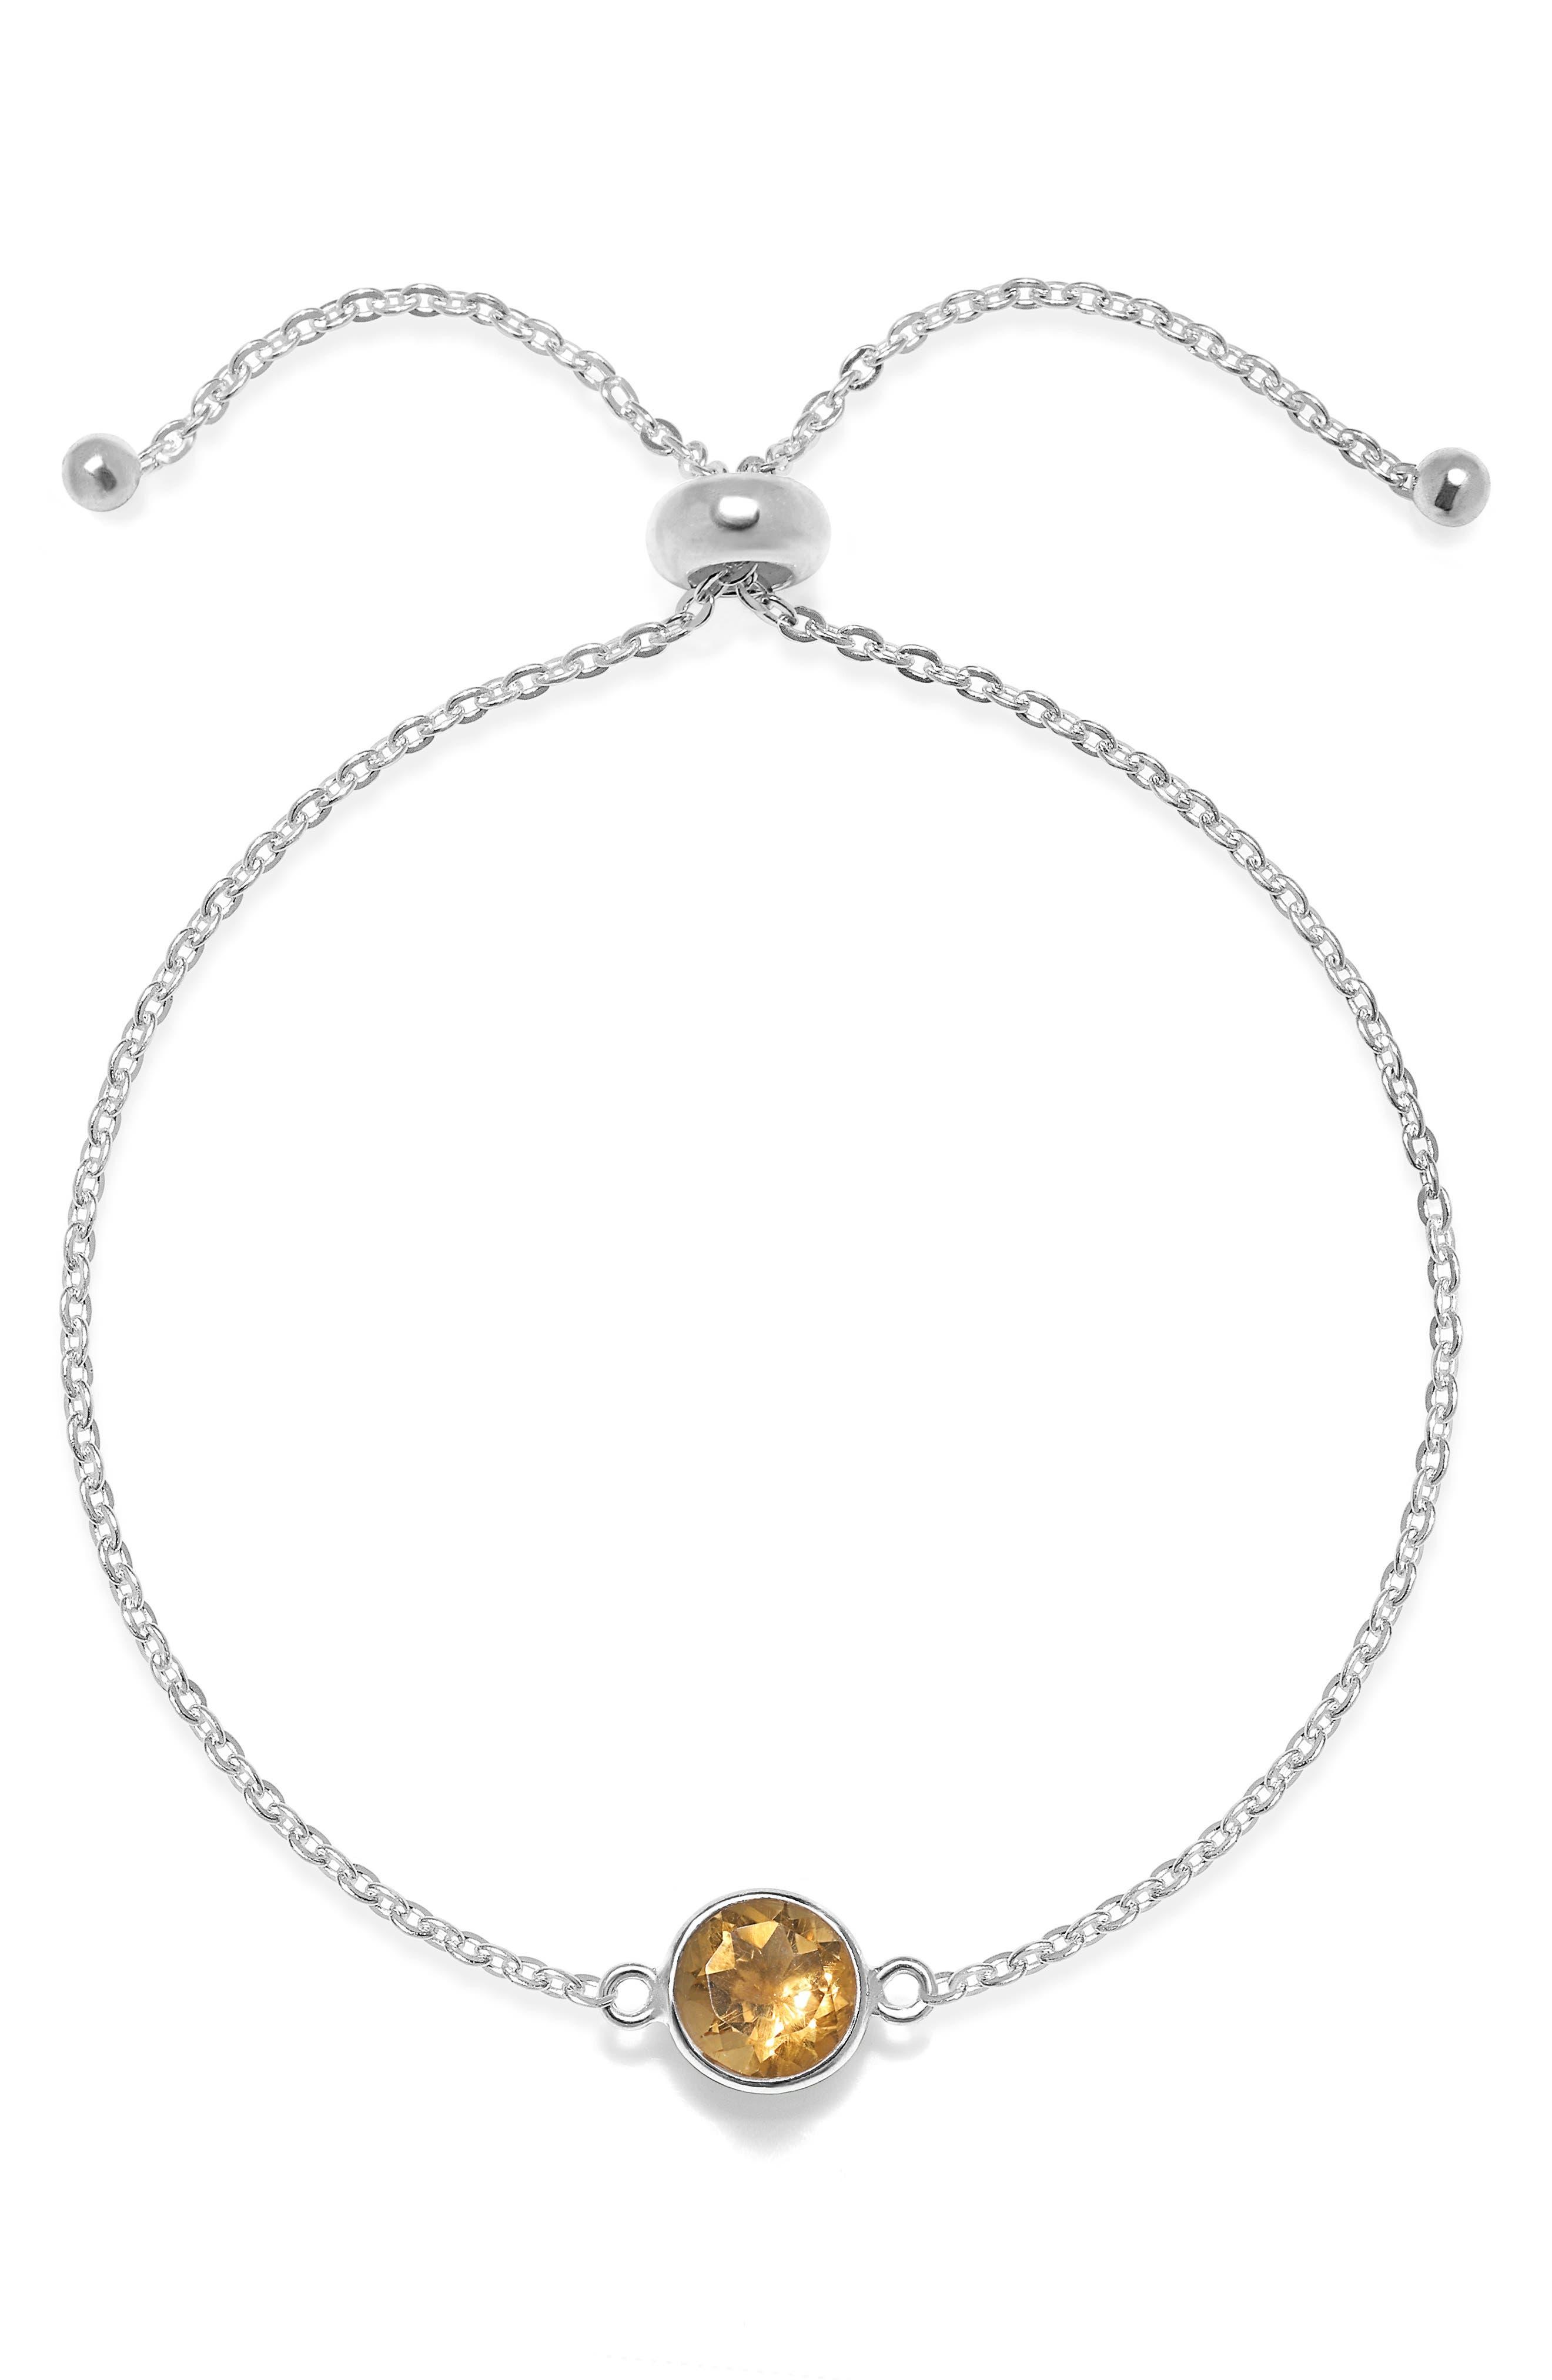 Amelia Rose Birthstone Bracelet in December/Sky Blue Topaz Gold at Nordstrom